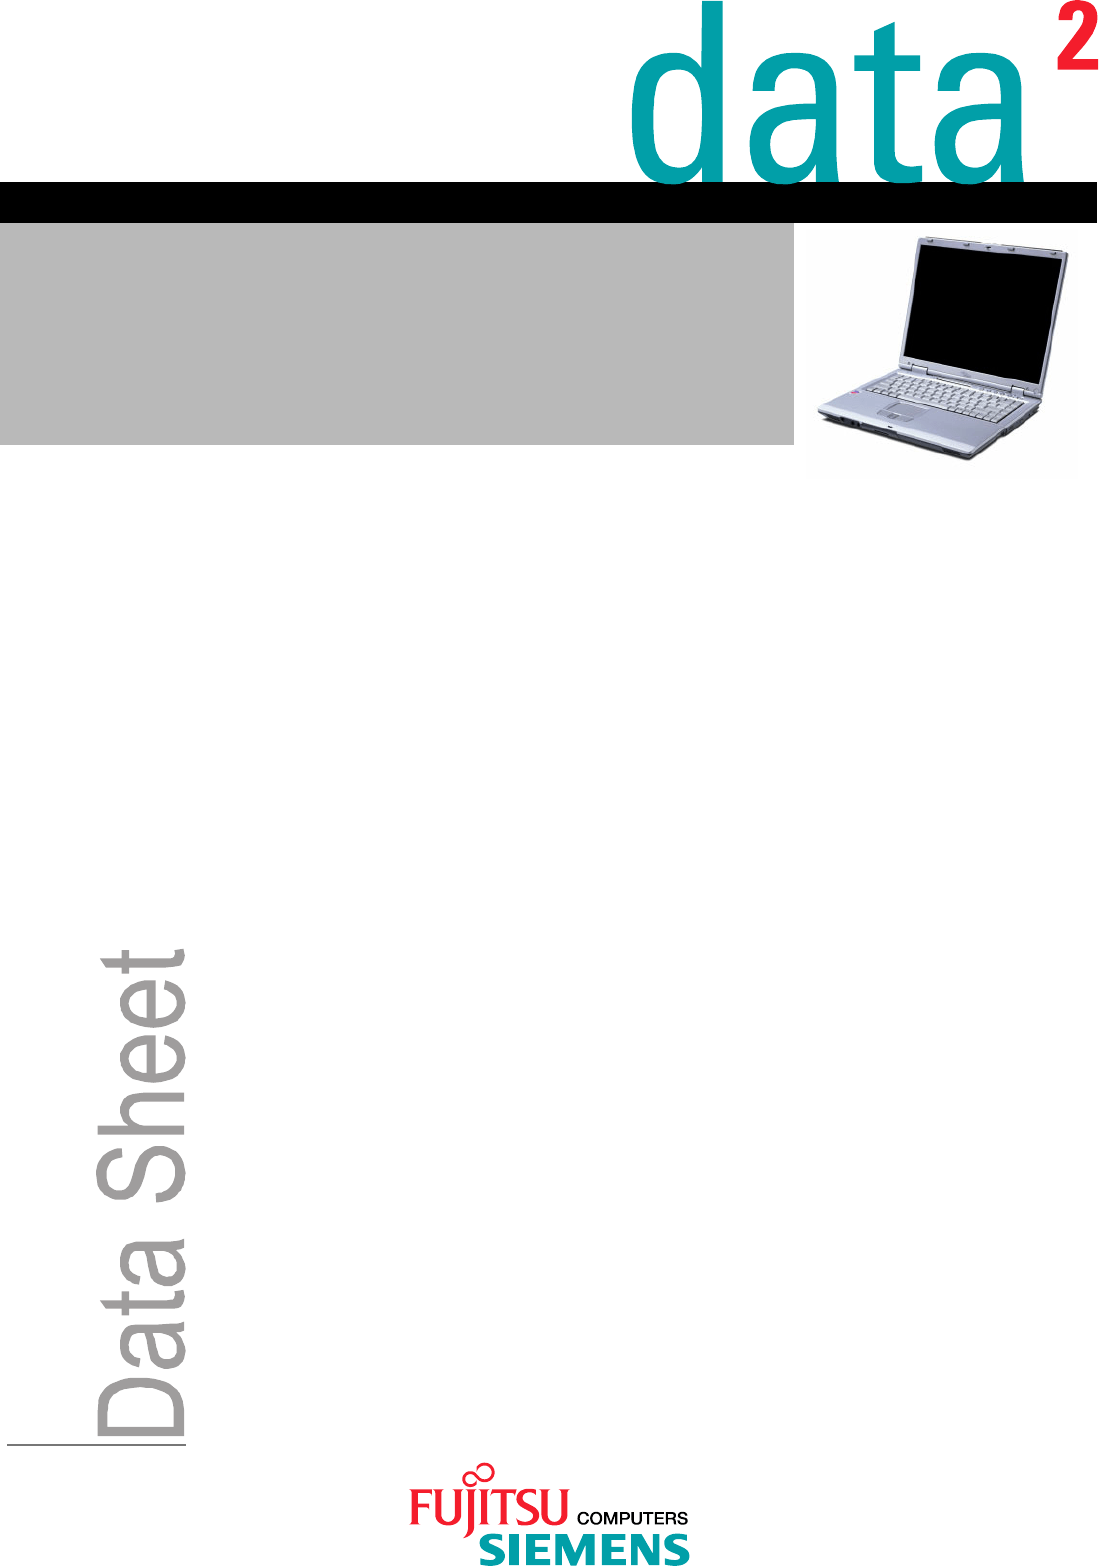 Fujitsu C1110D Users Manual Ds_c1110_c1110D_270603